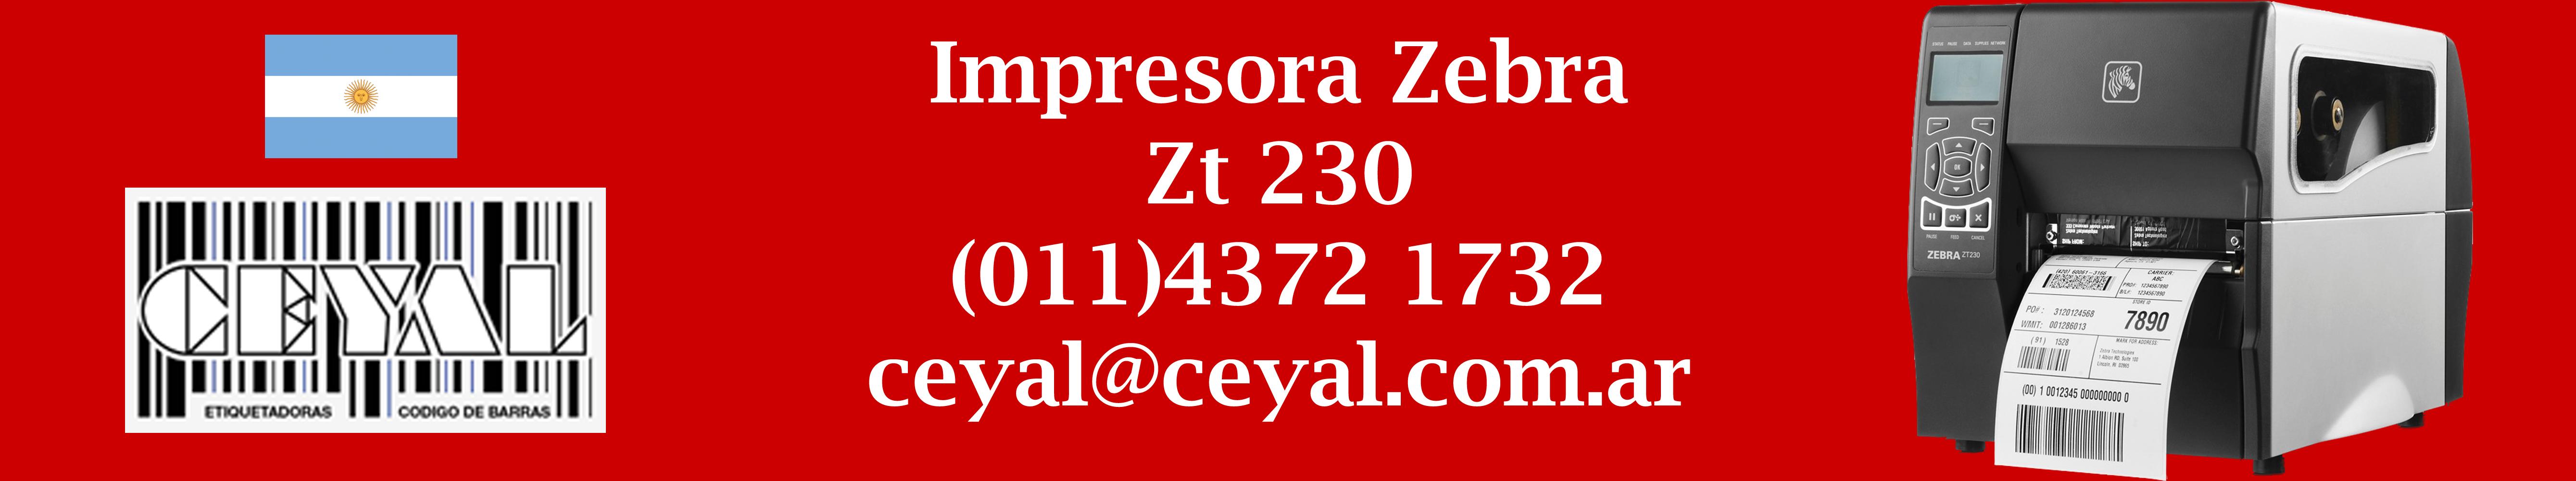 impresora zebra zt 230